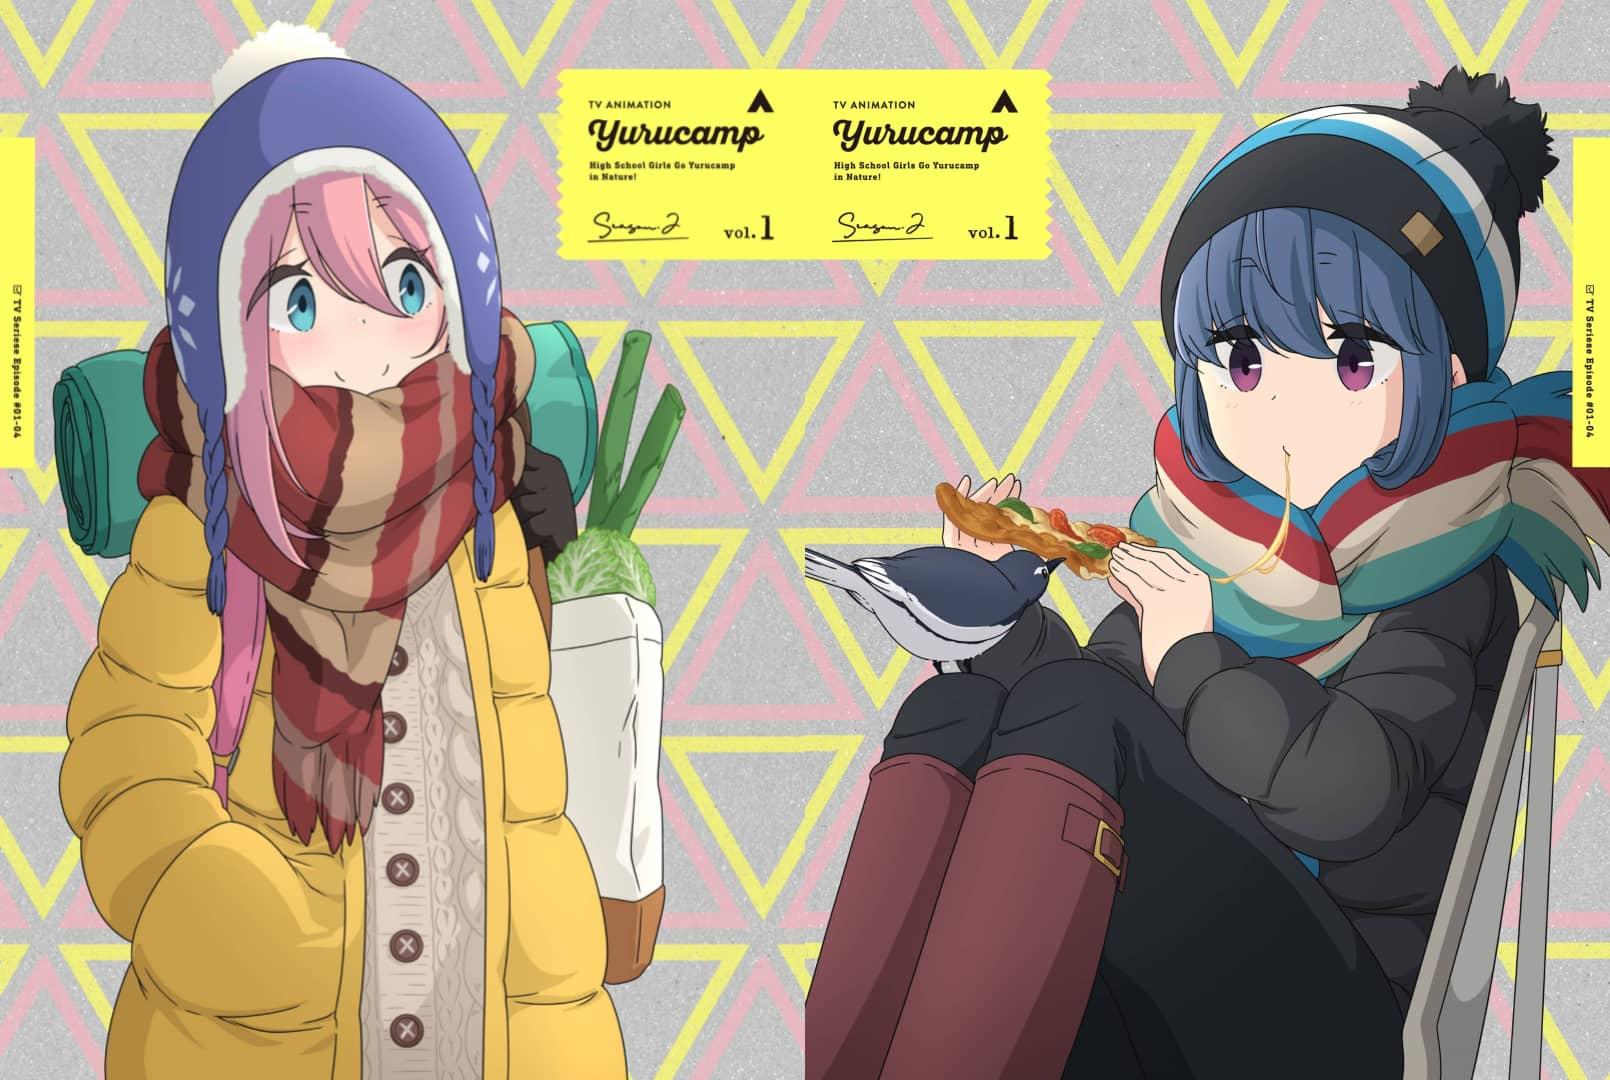 Yuru Camp Season 2 vol 1